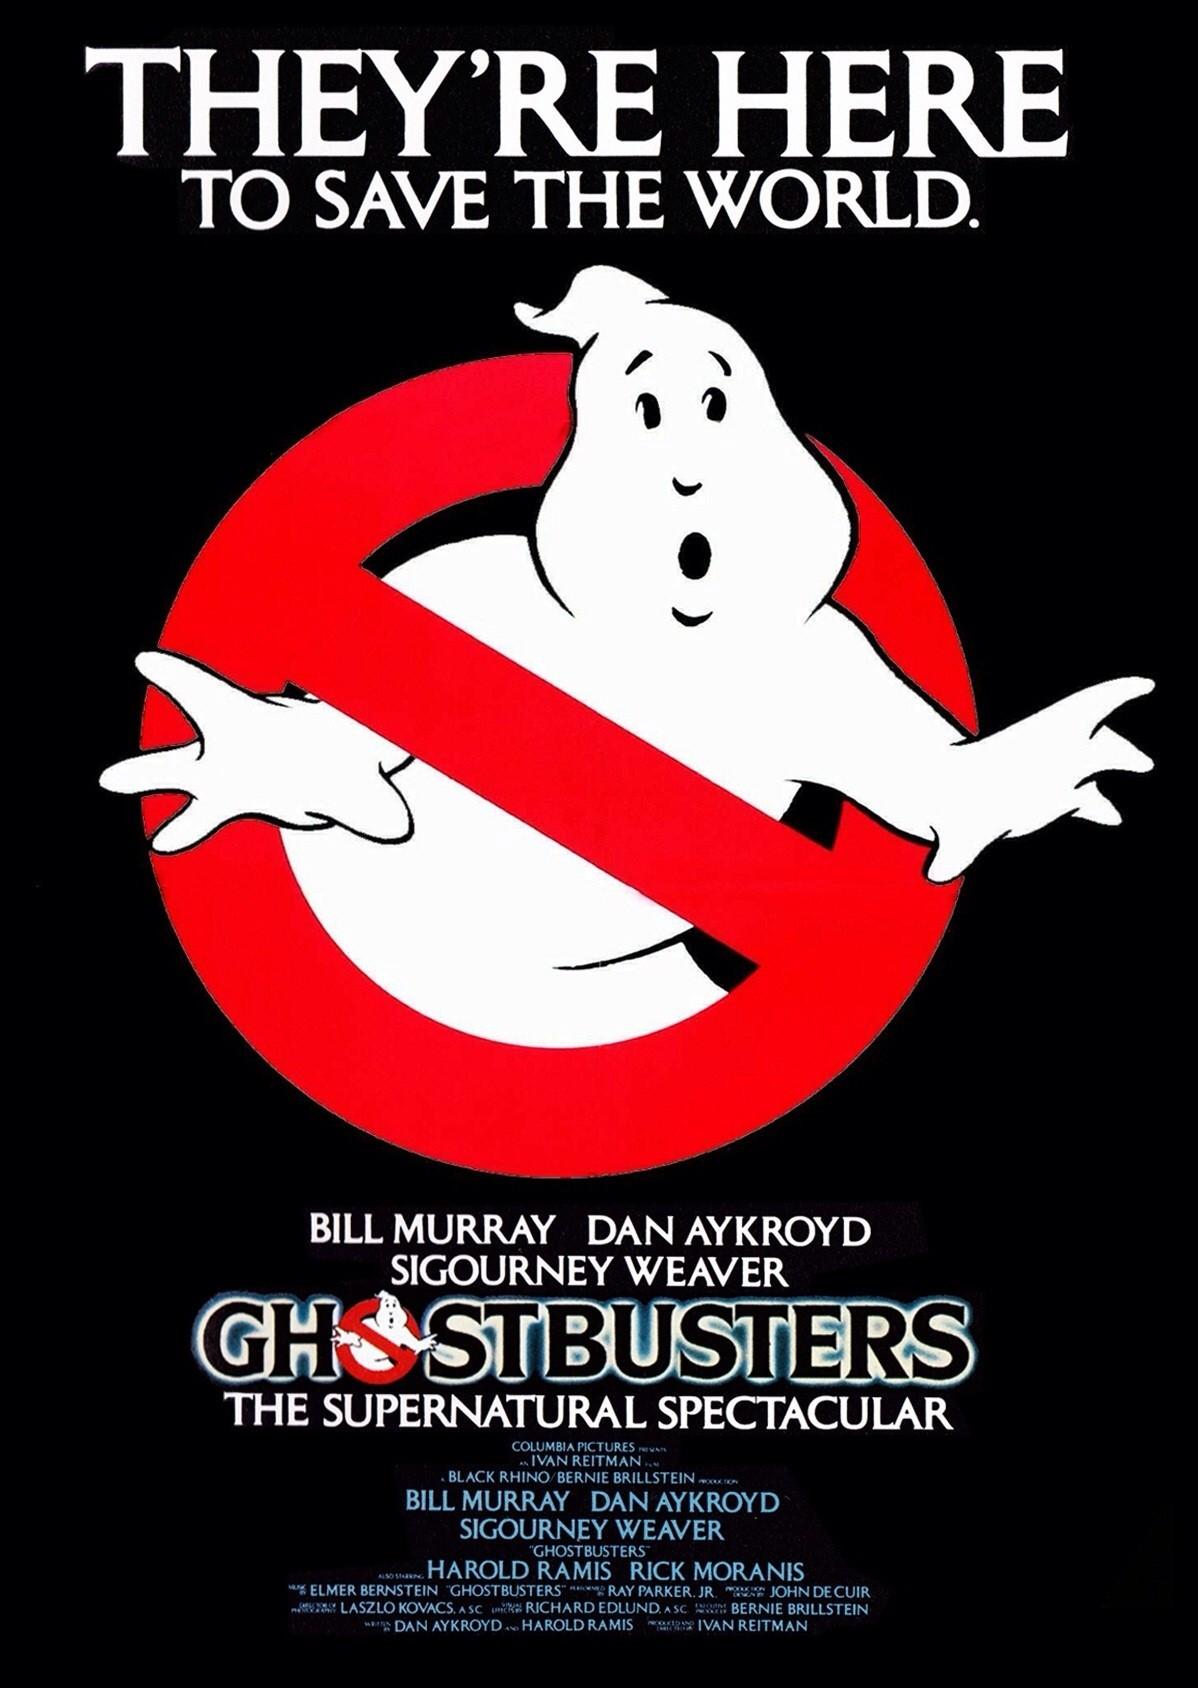 Ghostbuster Film